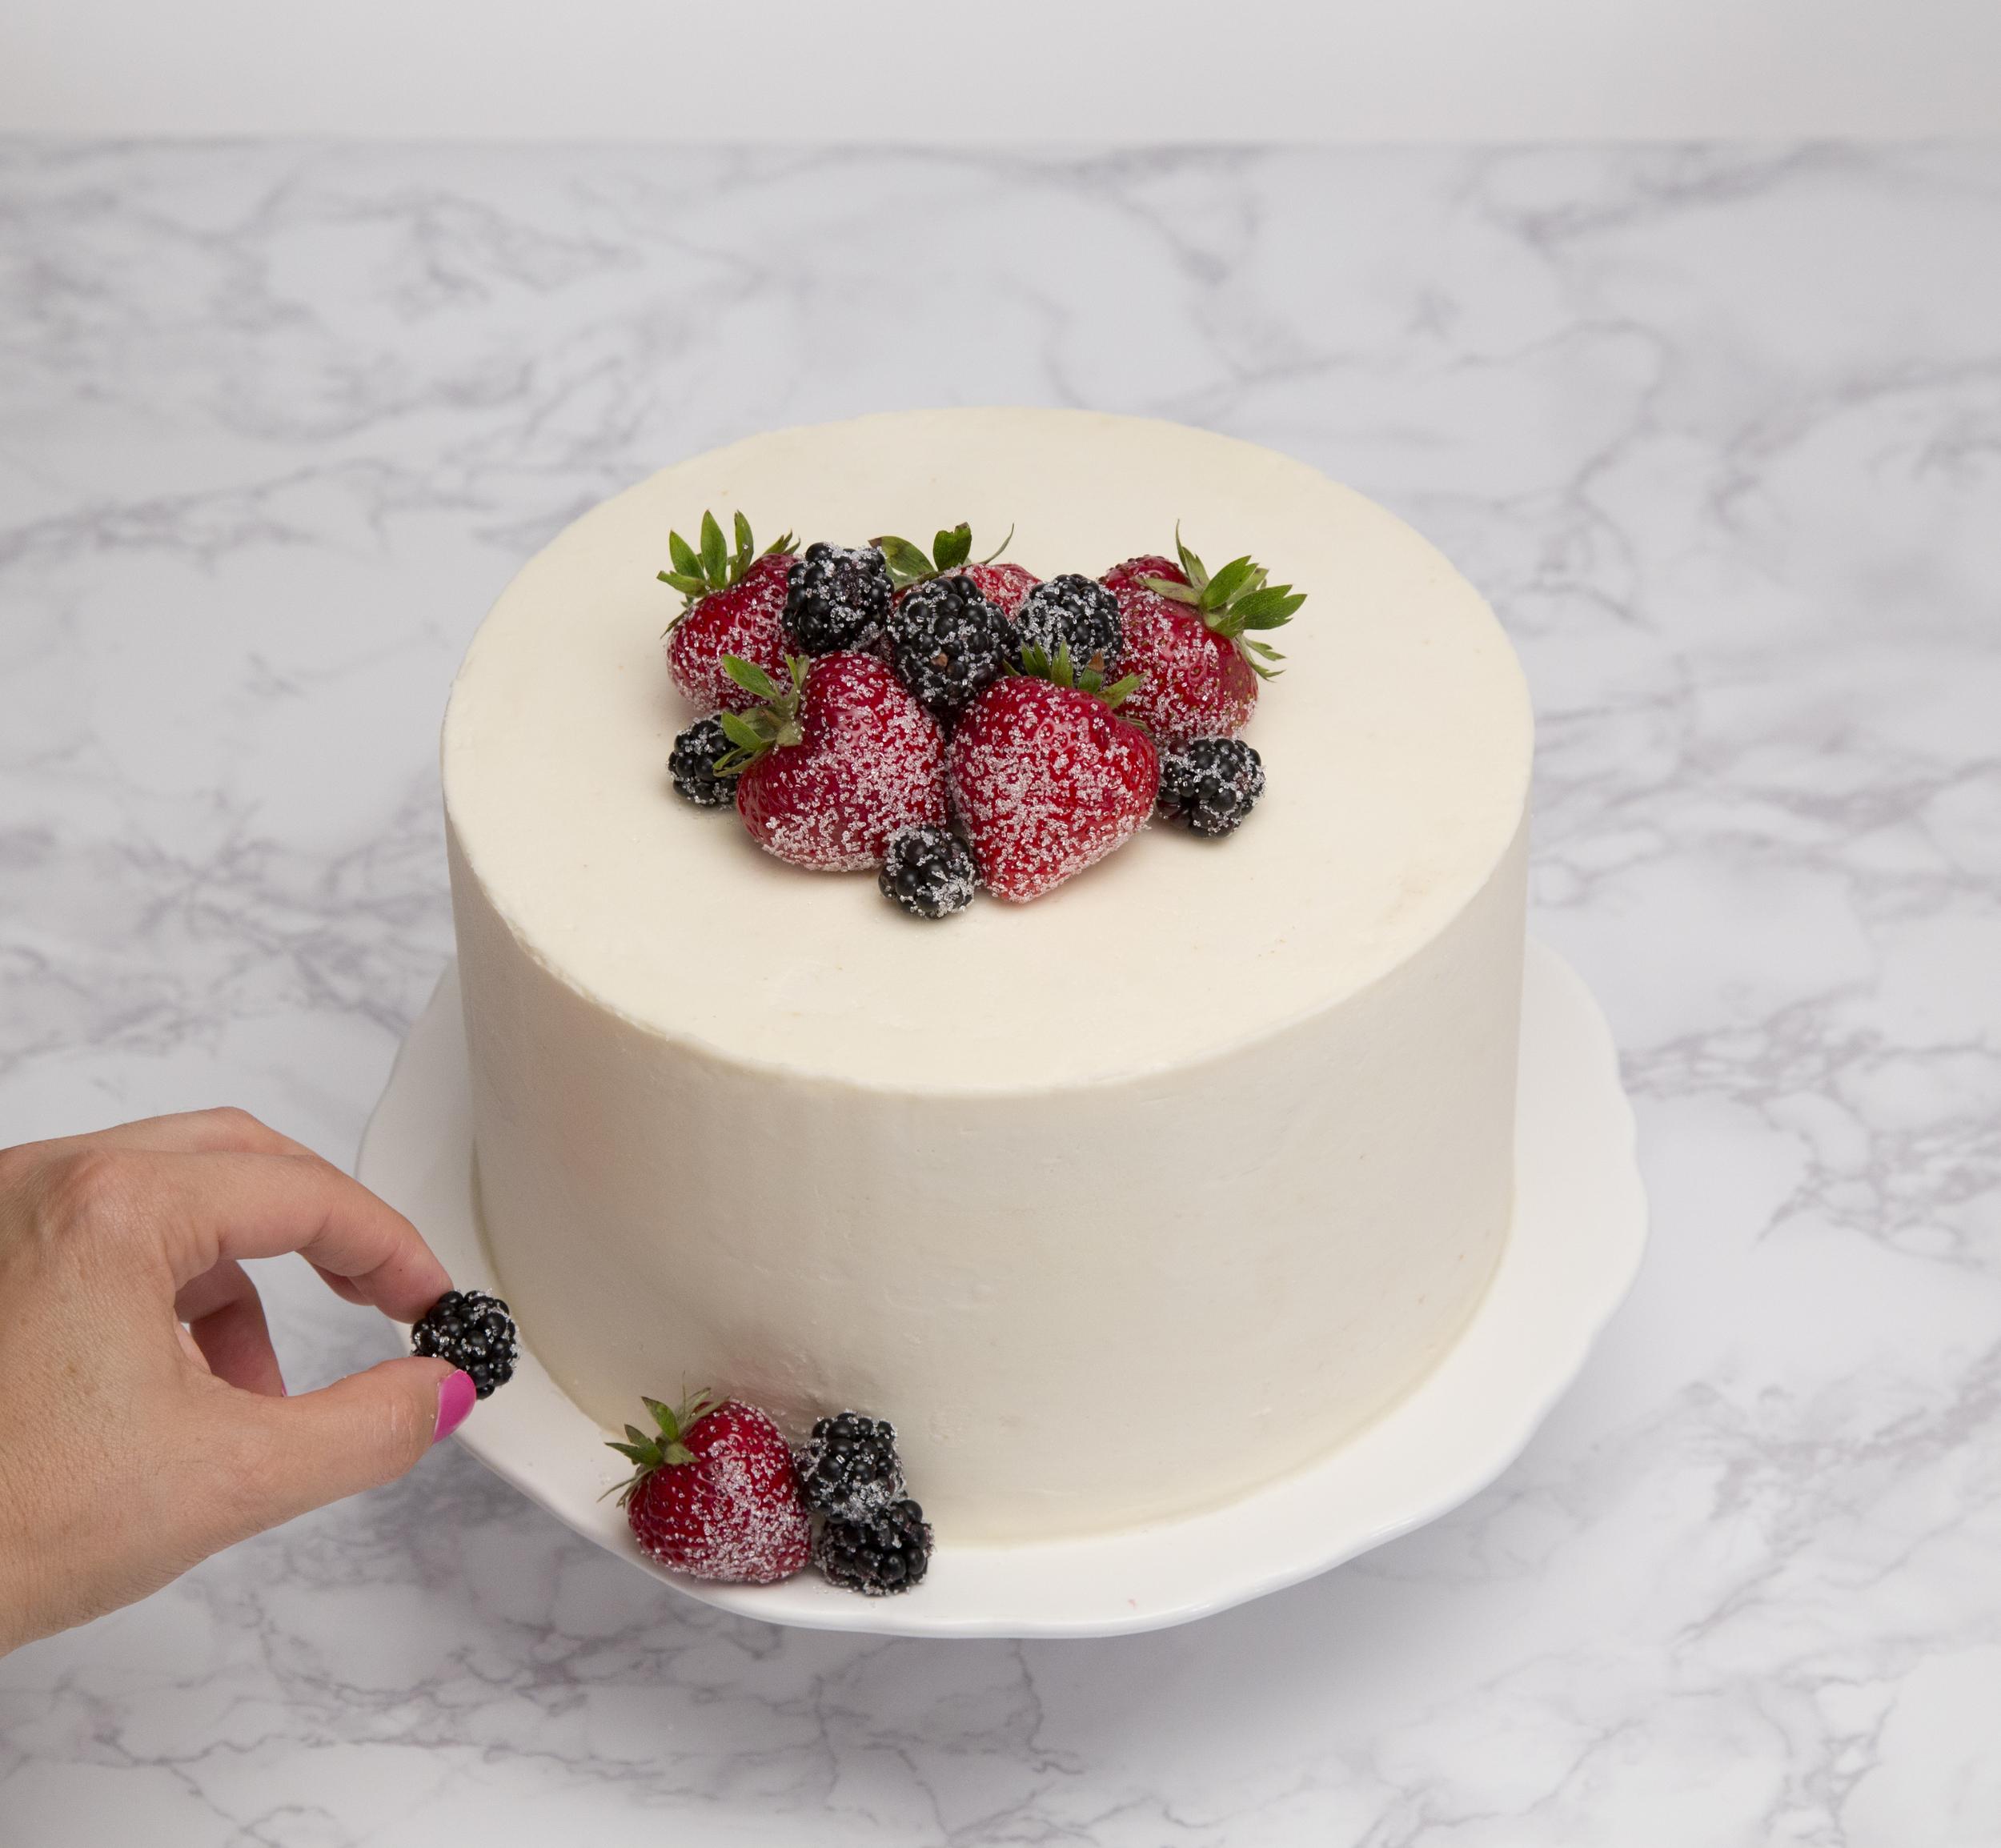 sugarberrycakehands.jpg